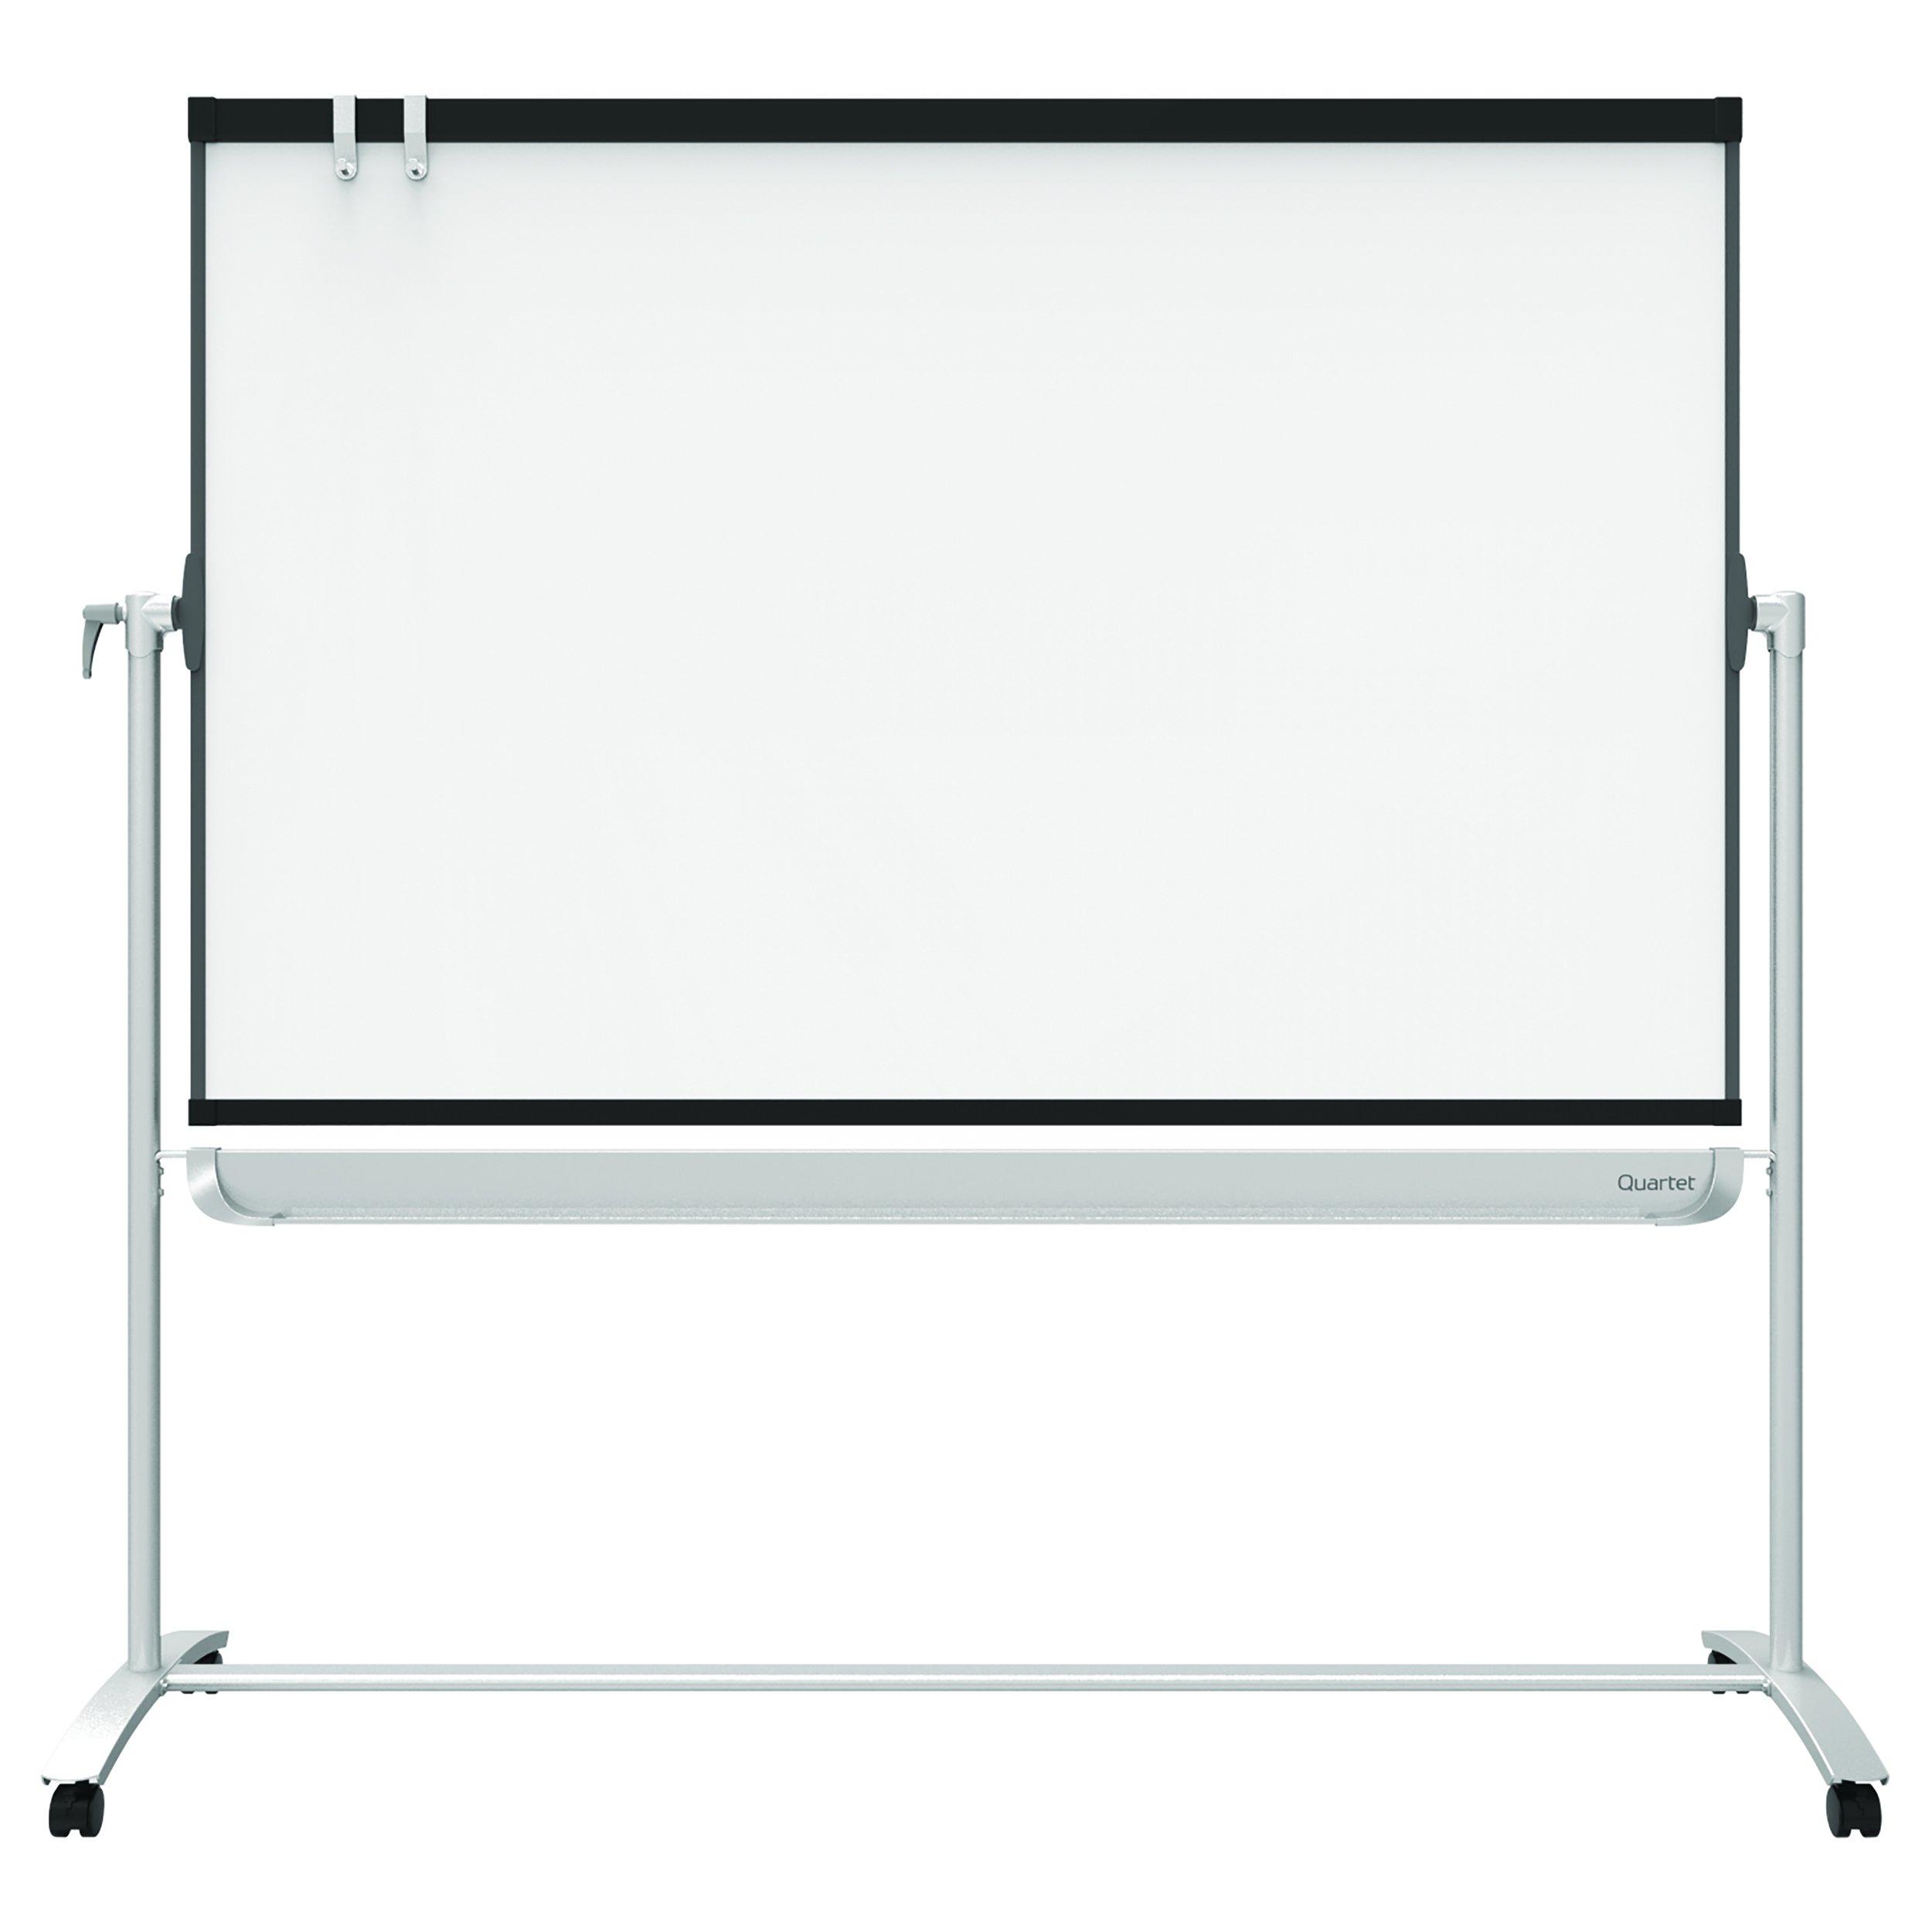 Quartet Mobile Easel, Prestige 2, Reversible Magnetic Whiteboard/Flipchart, 4' x 3', Graphite Frame (ECM43P2) by Quartet